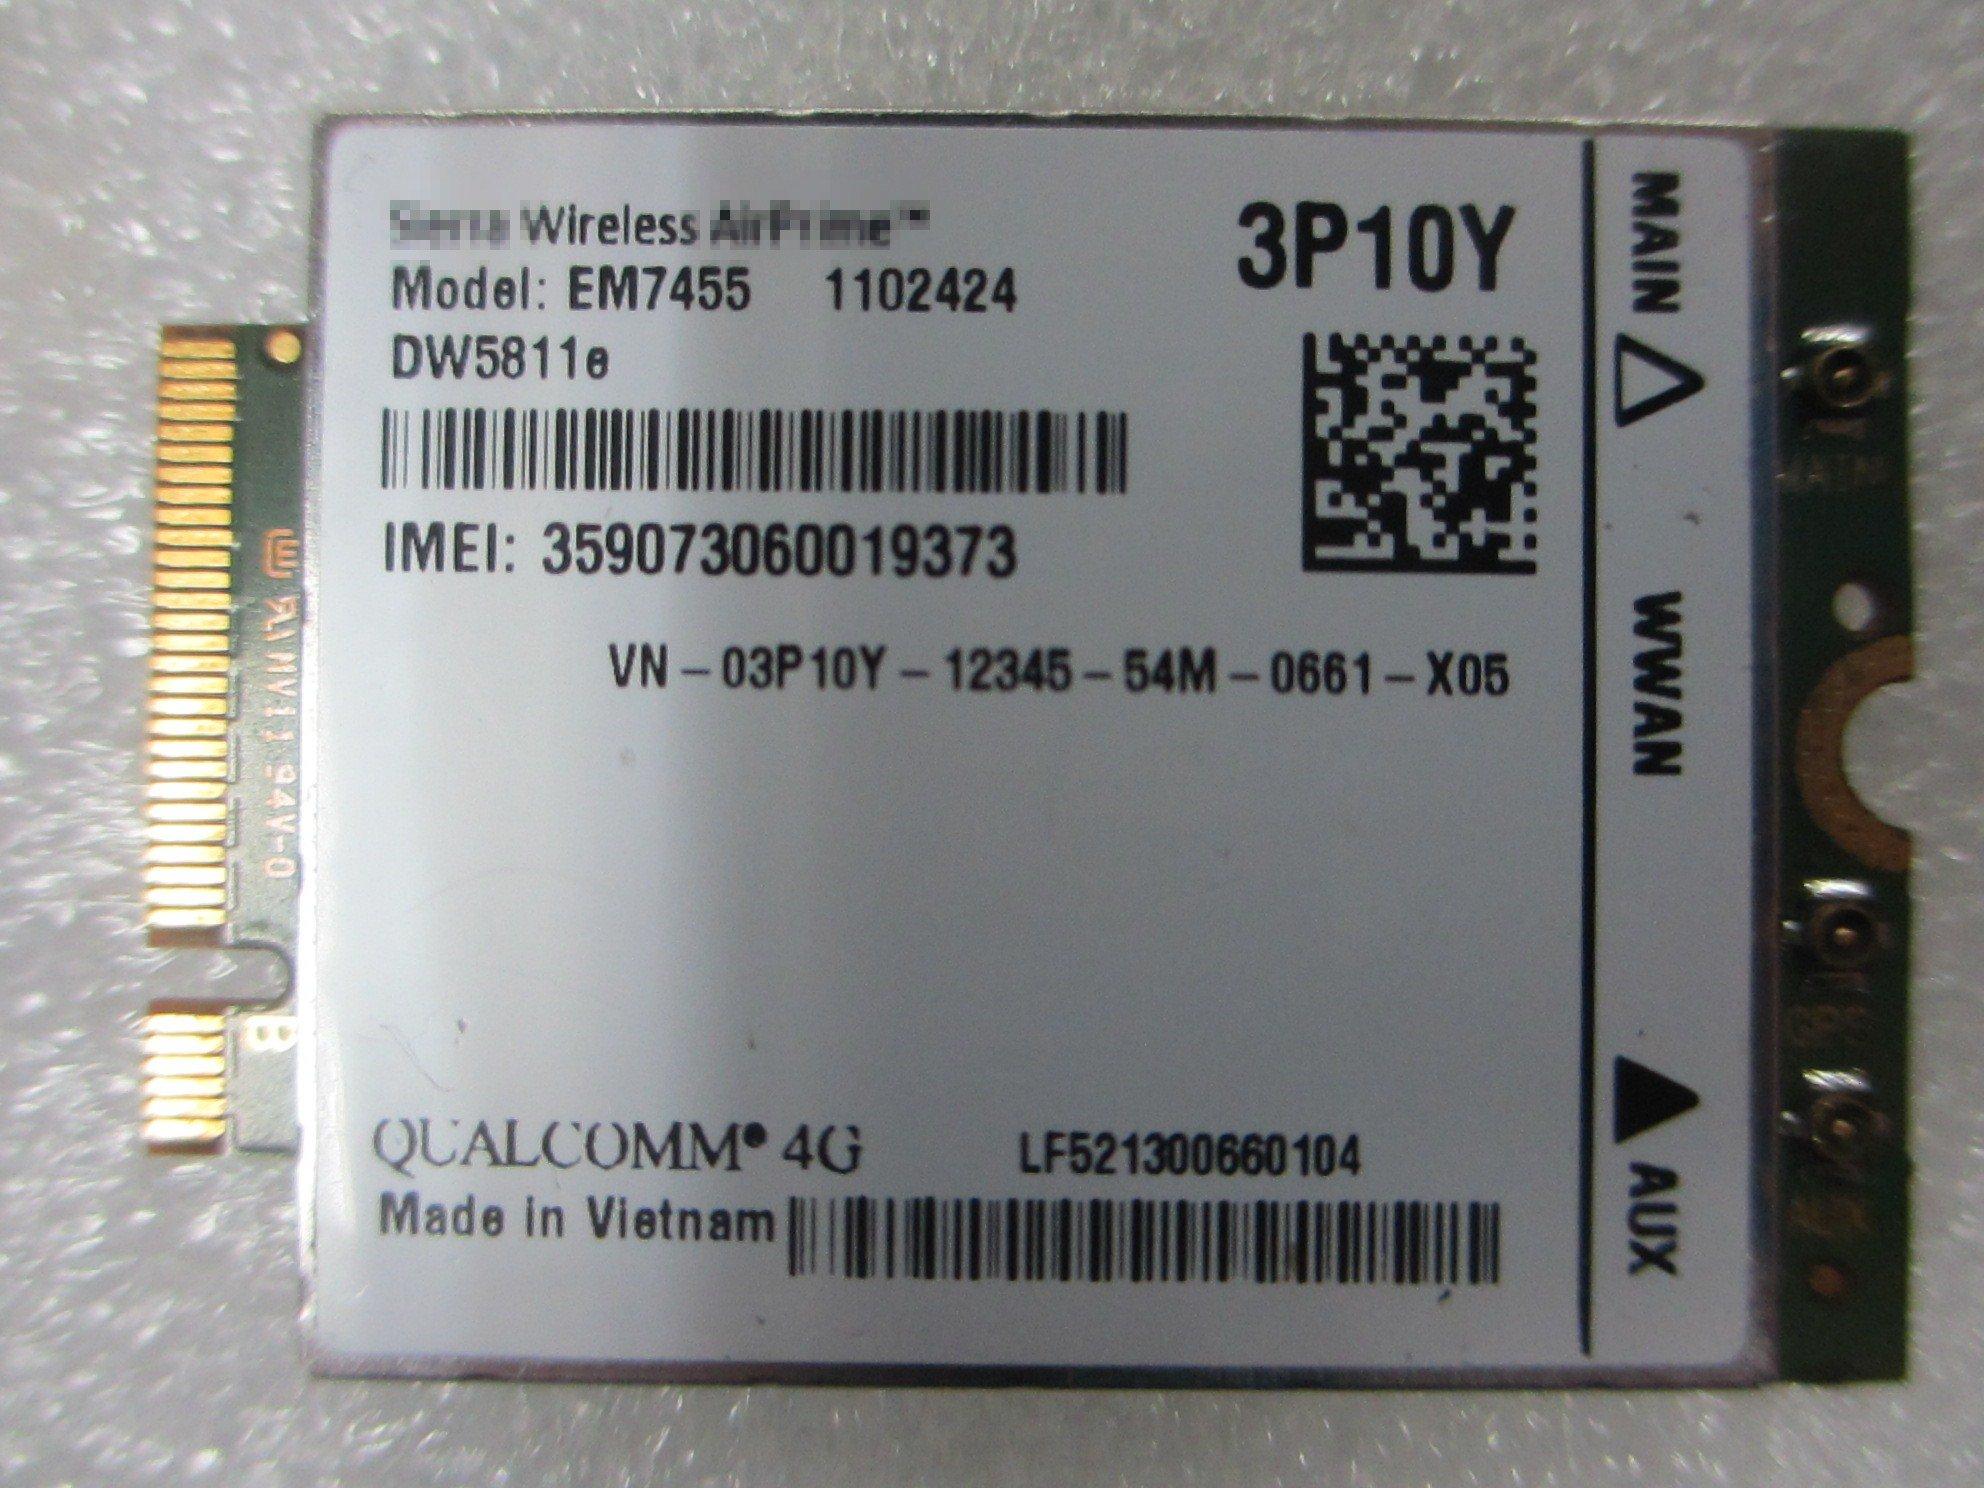 Wireless EM7455 LTE 4G NGFF module DW5811E 3P10Y + FREE ANTENNA by Generic